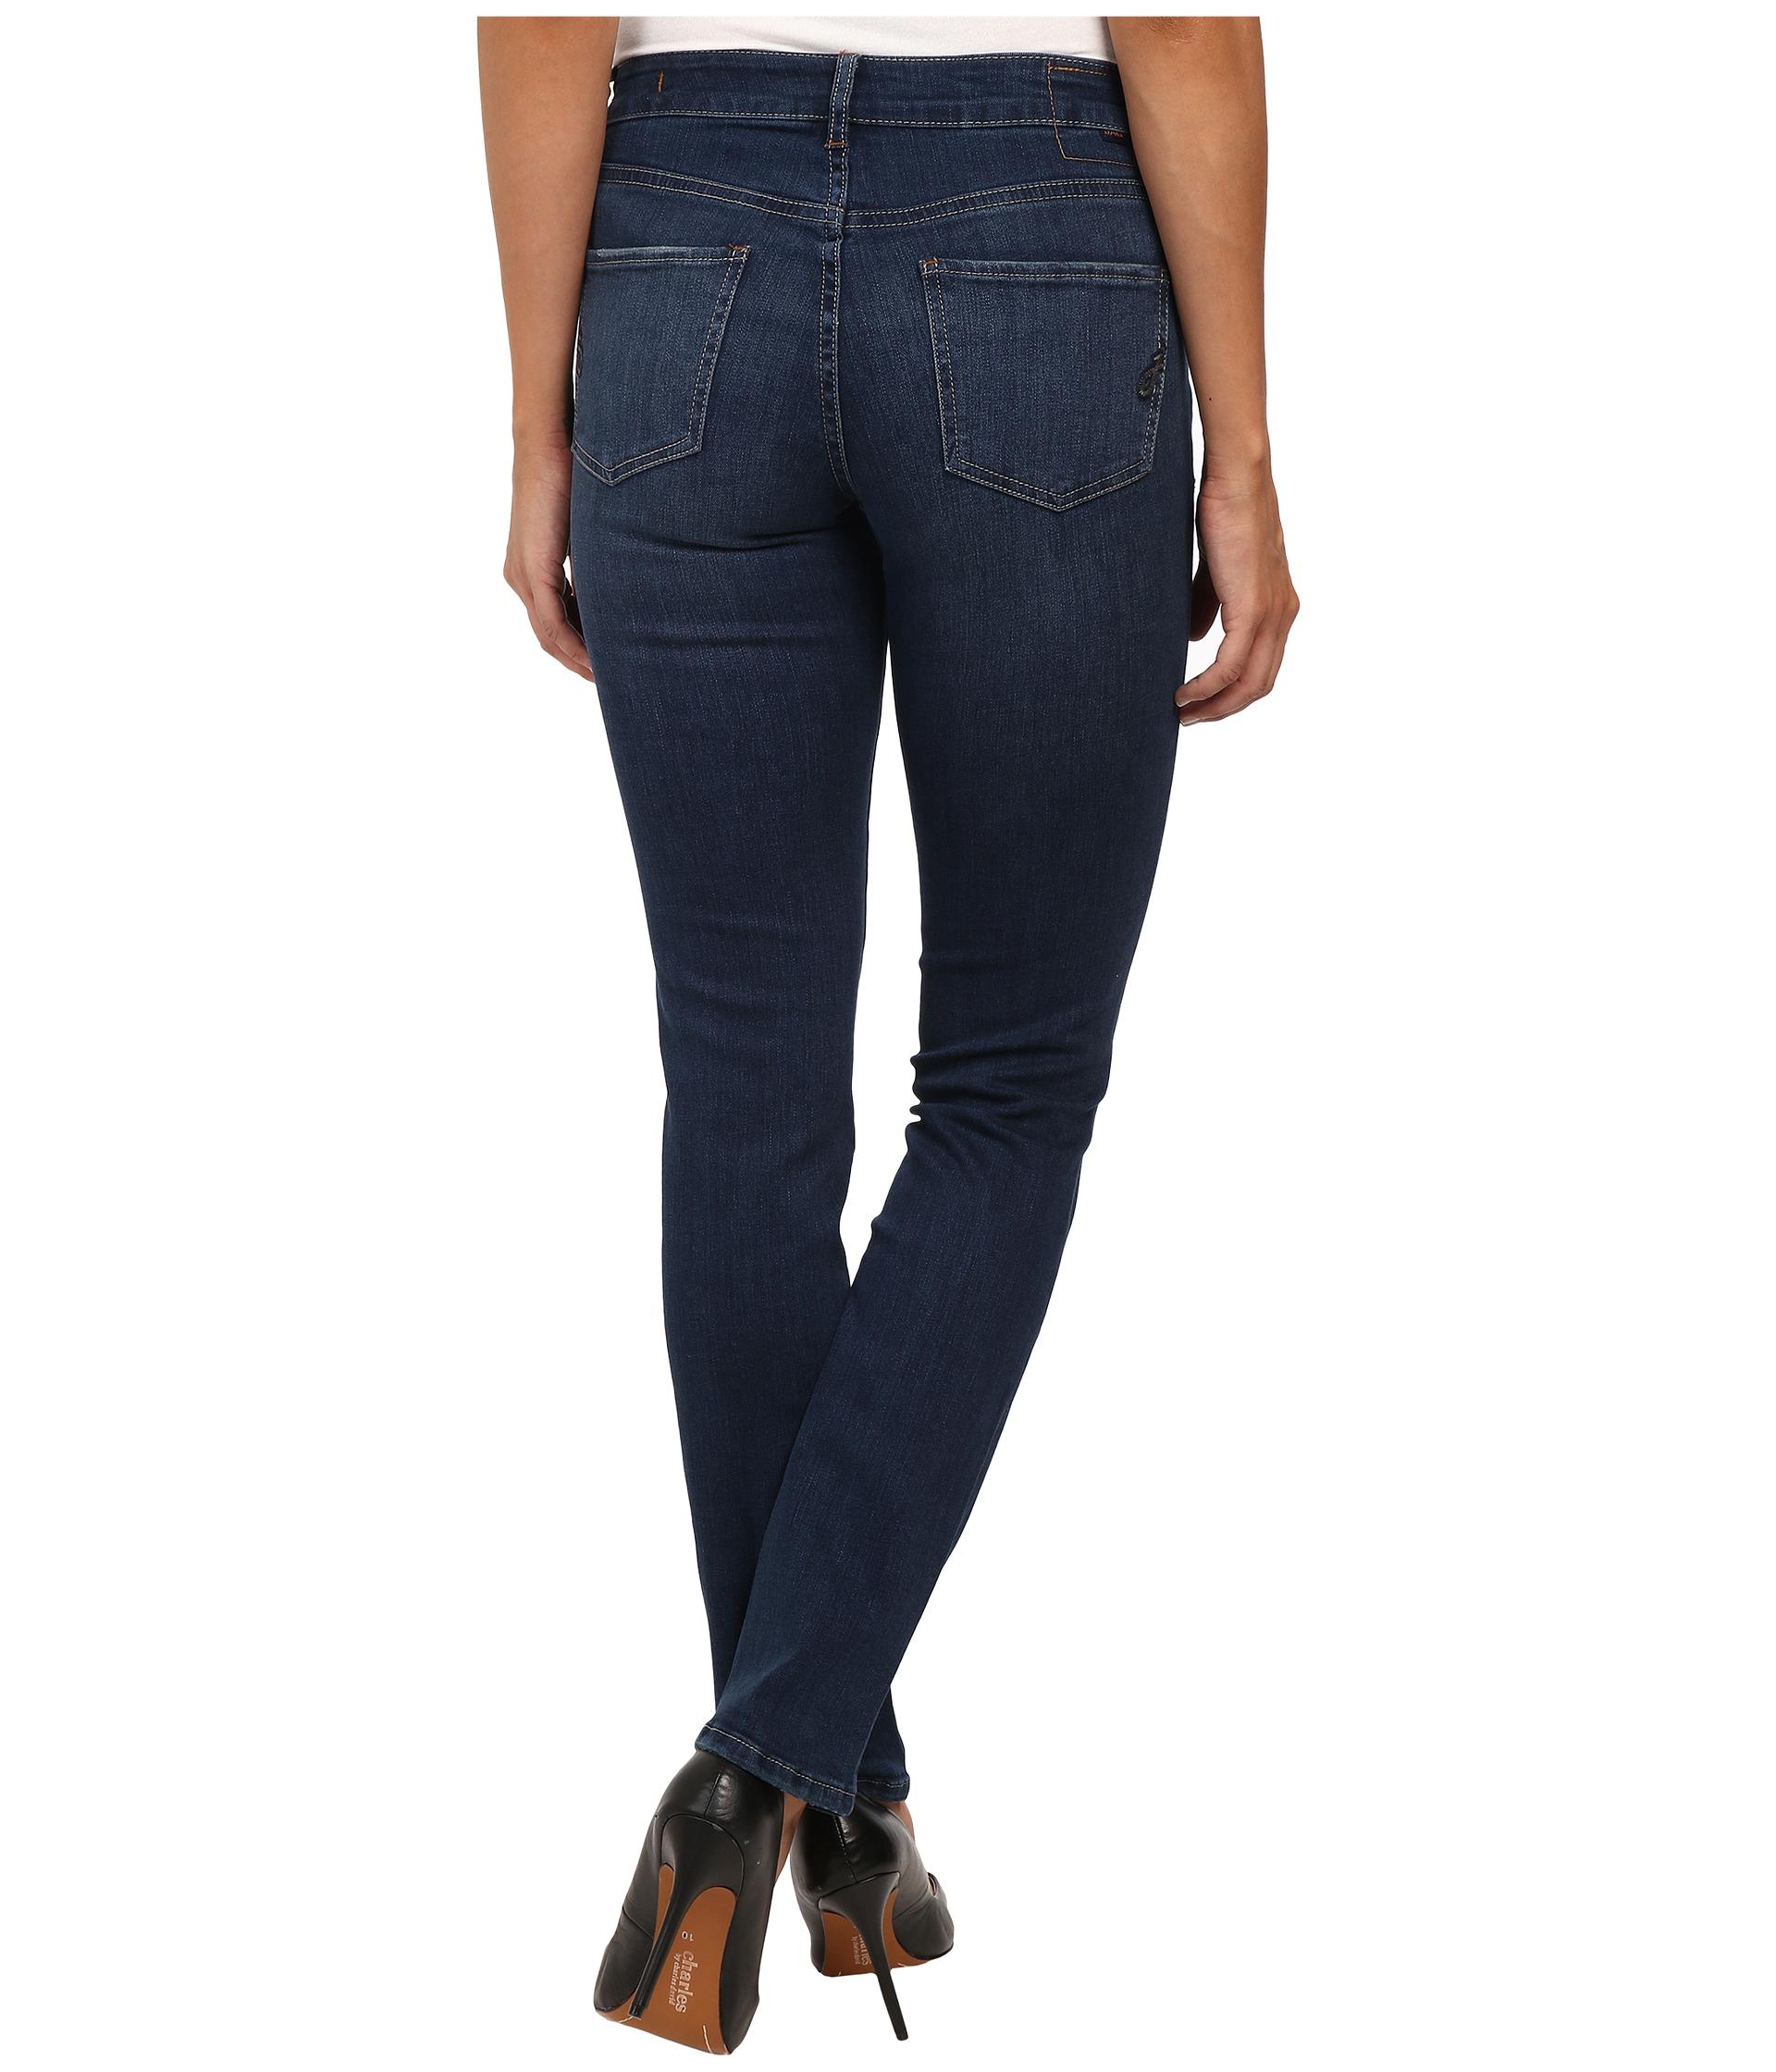 Jag jeans Grant Mid Rise Slim Republic Denim In Blue Shadow in Blue   Lyst